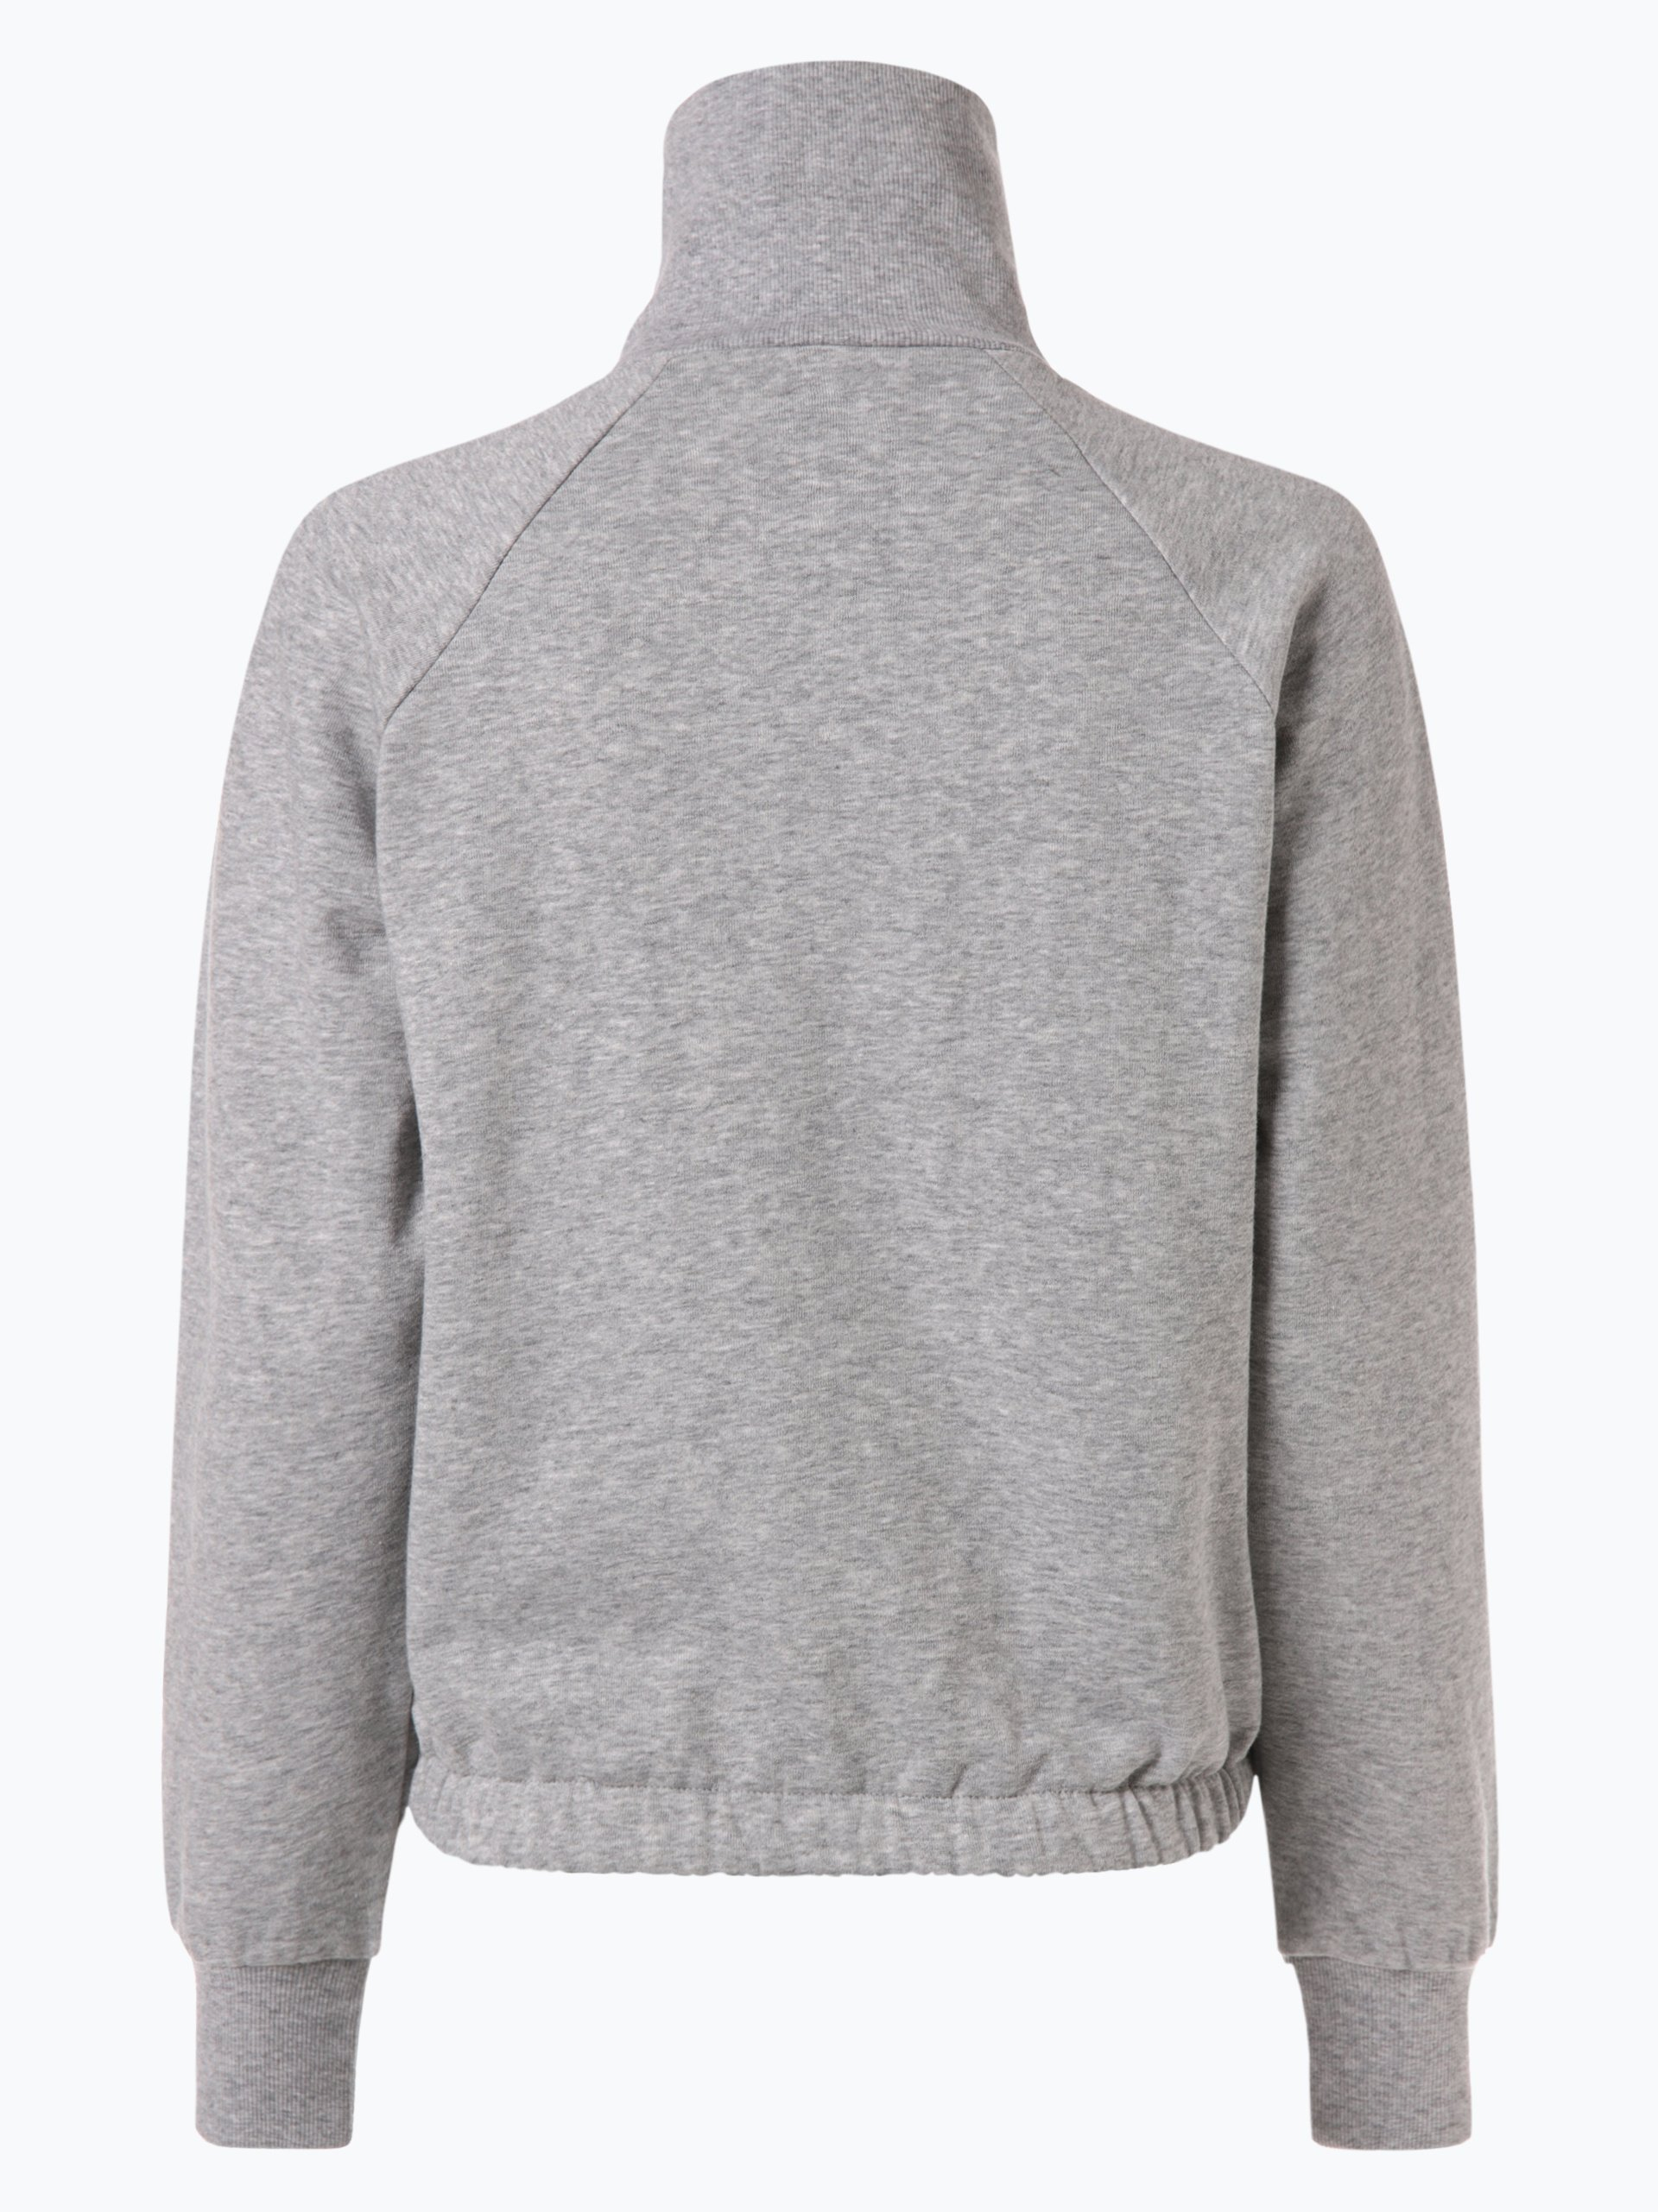 Juicy by Juicy Couture Damska bluza nierozpinana